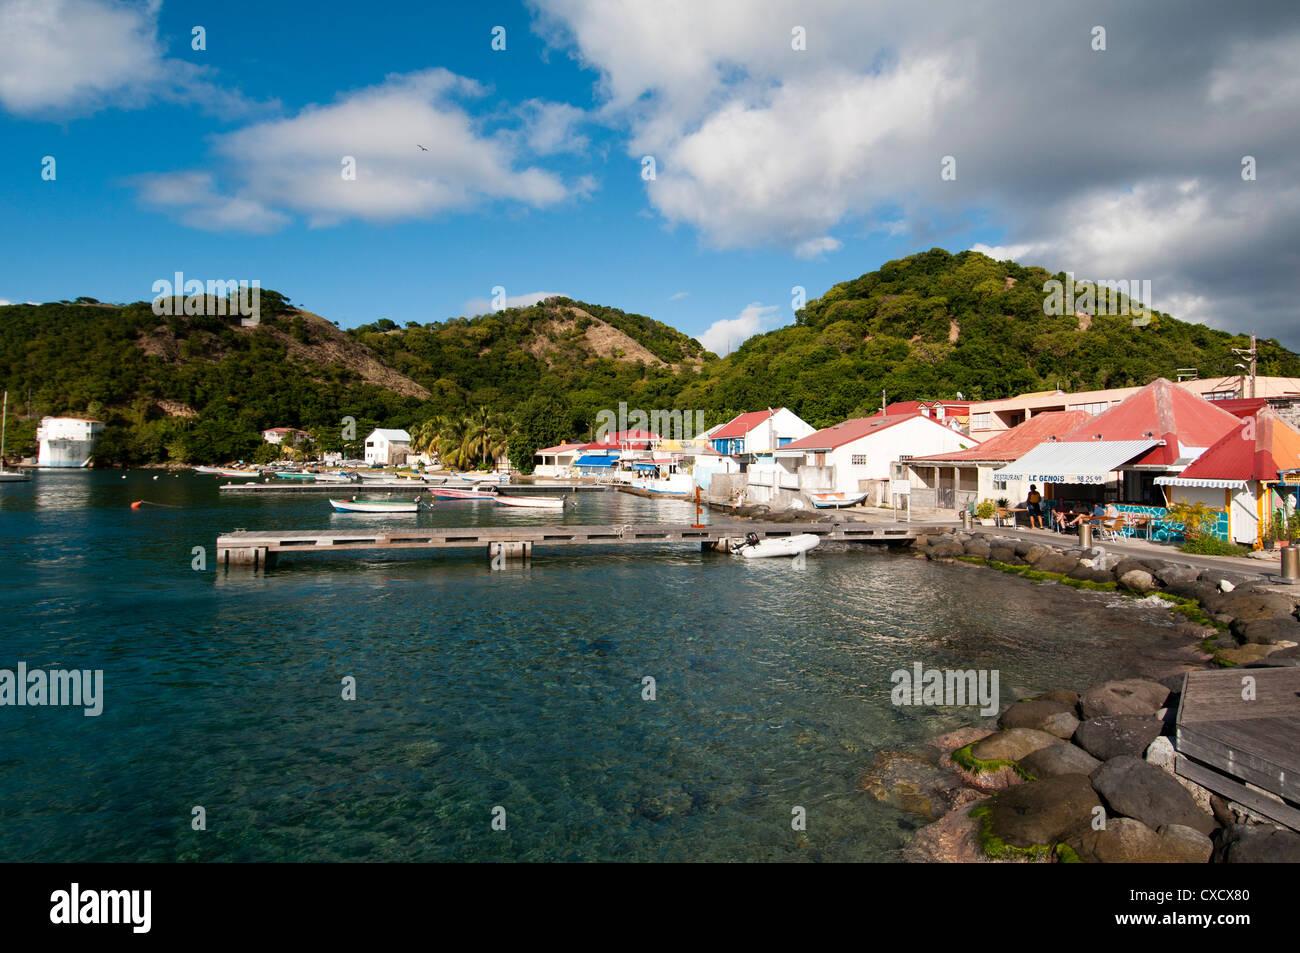 Le Bourg, Iles des Saintes, Terre de Haut, Guadeloupe, Französisch, Frankreich, West Indies, Karibik Mittelamerika Stockbild